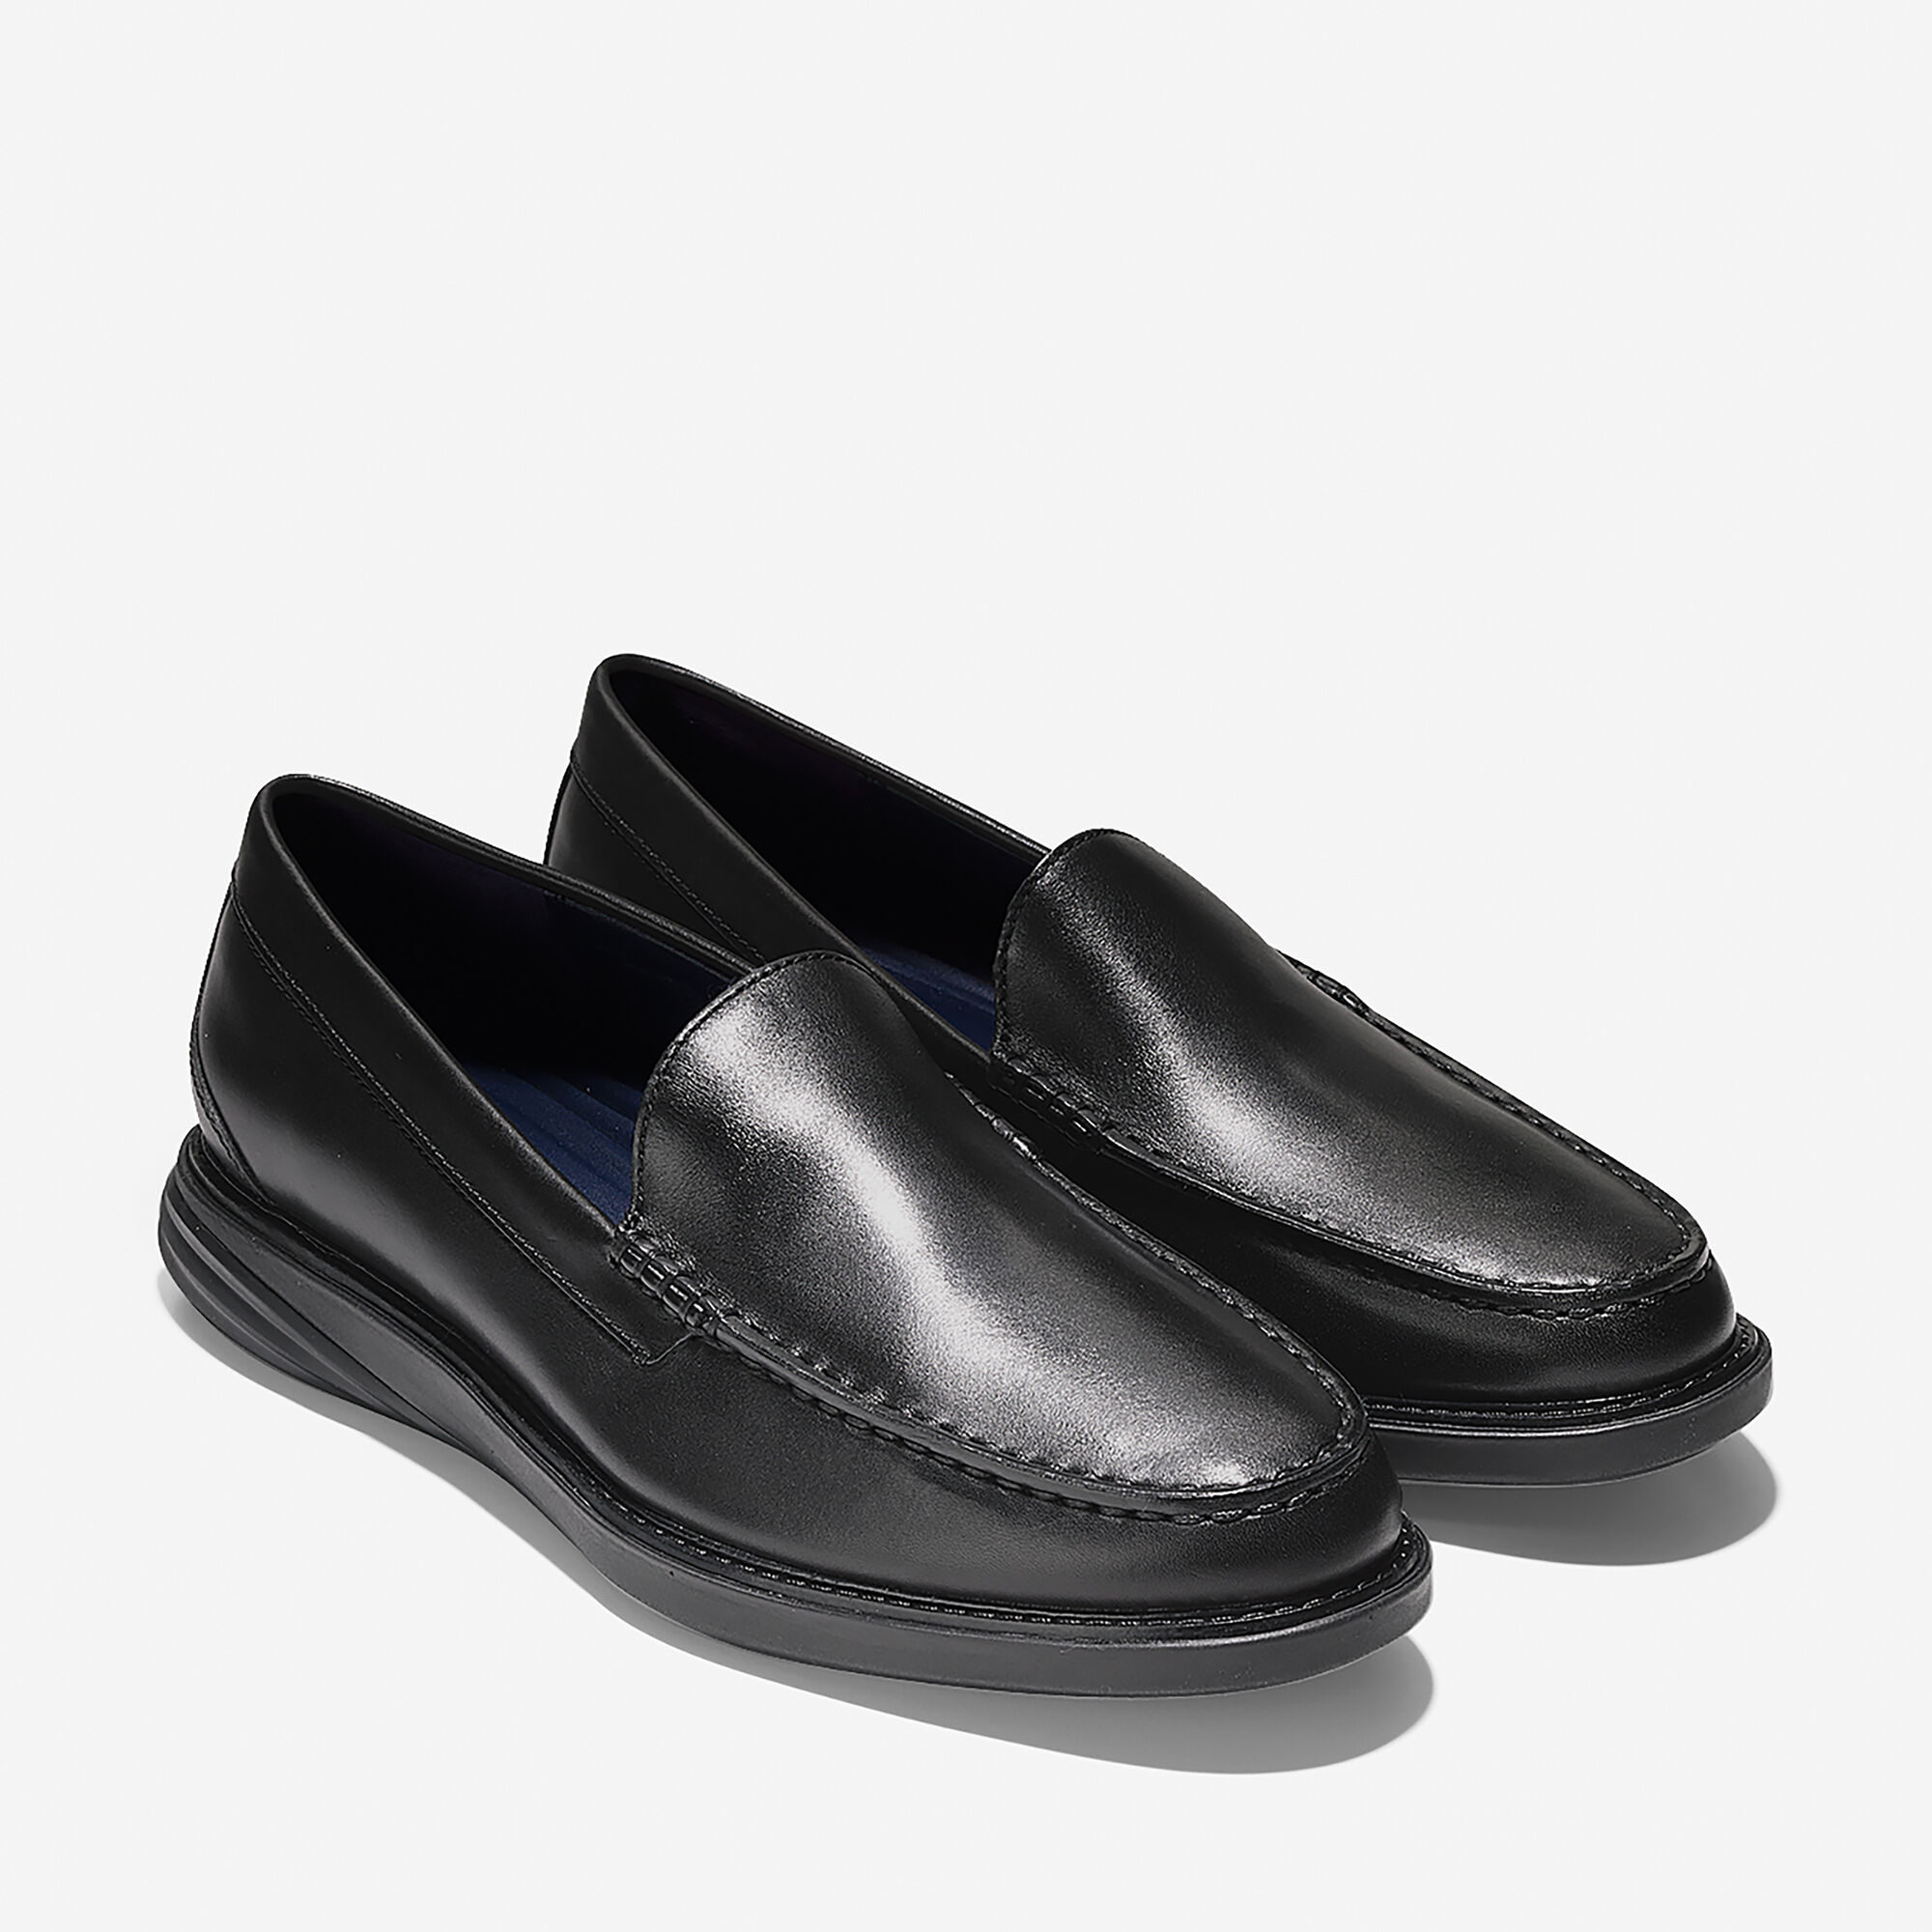 798008d916f Cole Haan Men s GrandEvølution Venetian Loafer in Black-black ...